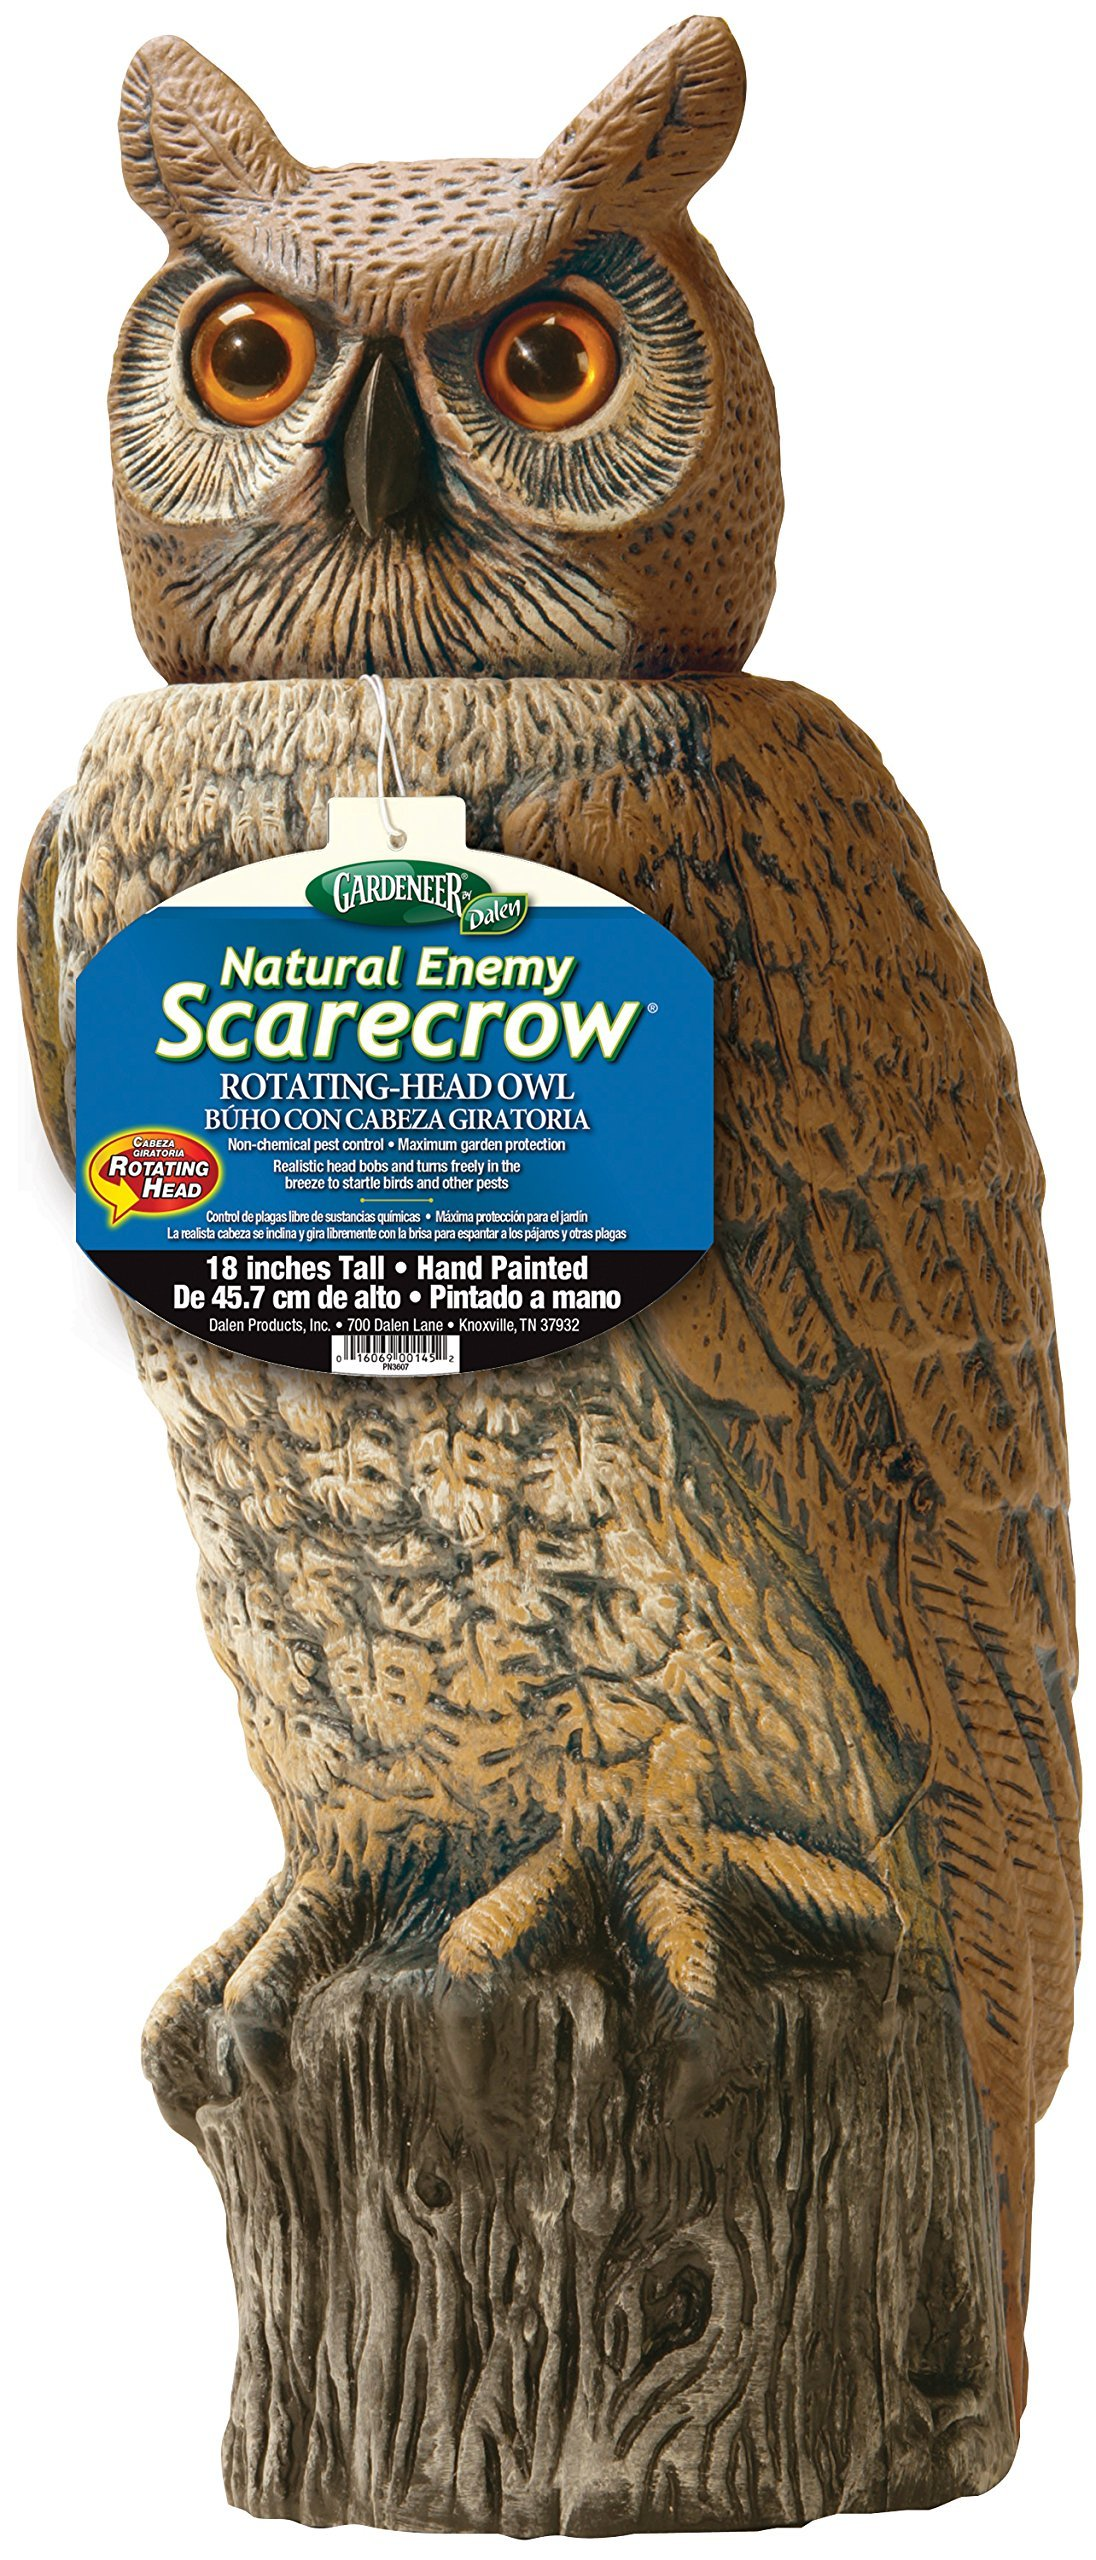 Gardeneer By Dalen RHO4 Natural Enemy Scarecrow Rotating Head Owl, Brown, 18 In. H. (Renewed) by Dalen